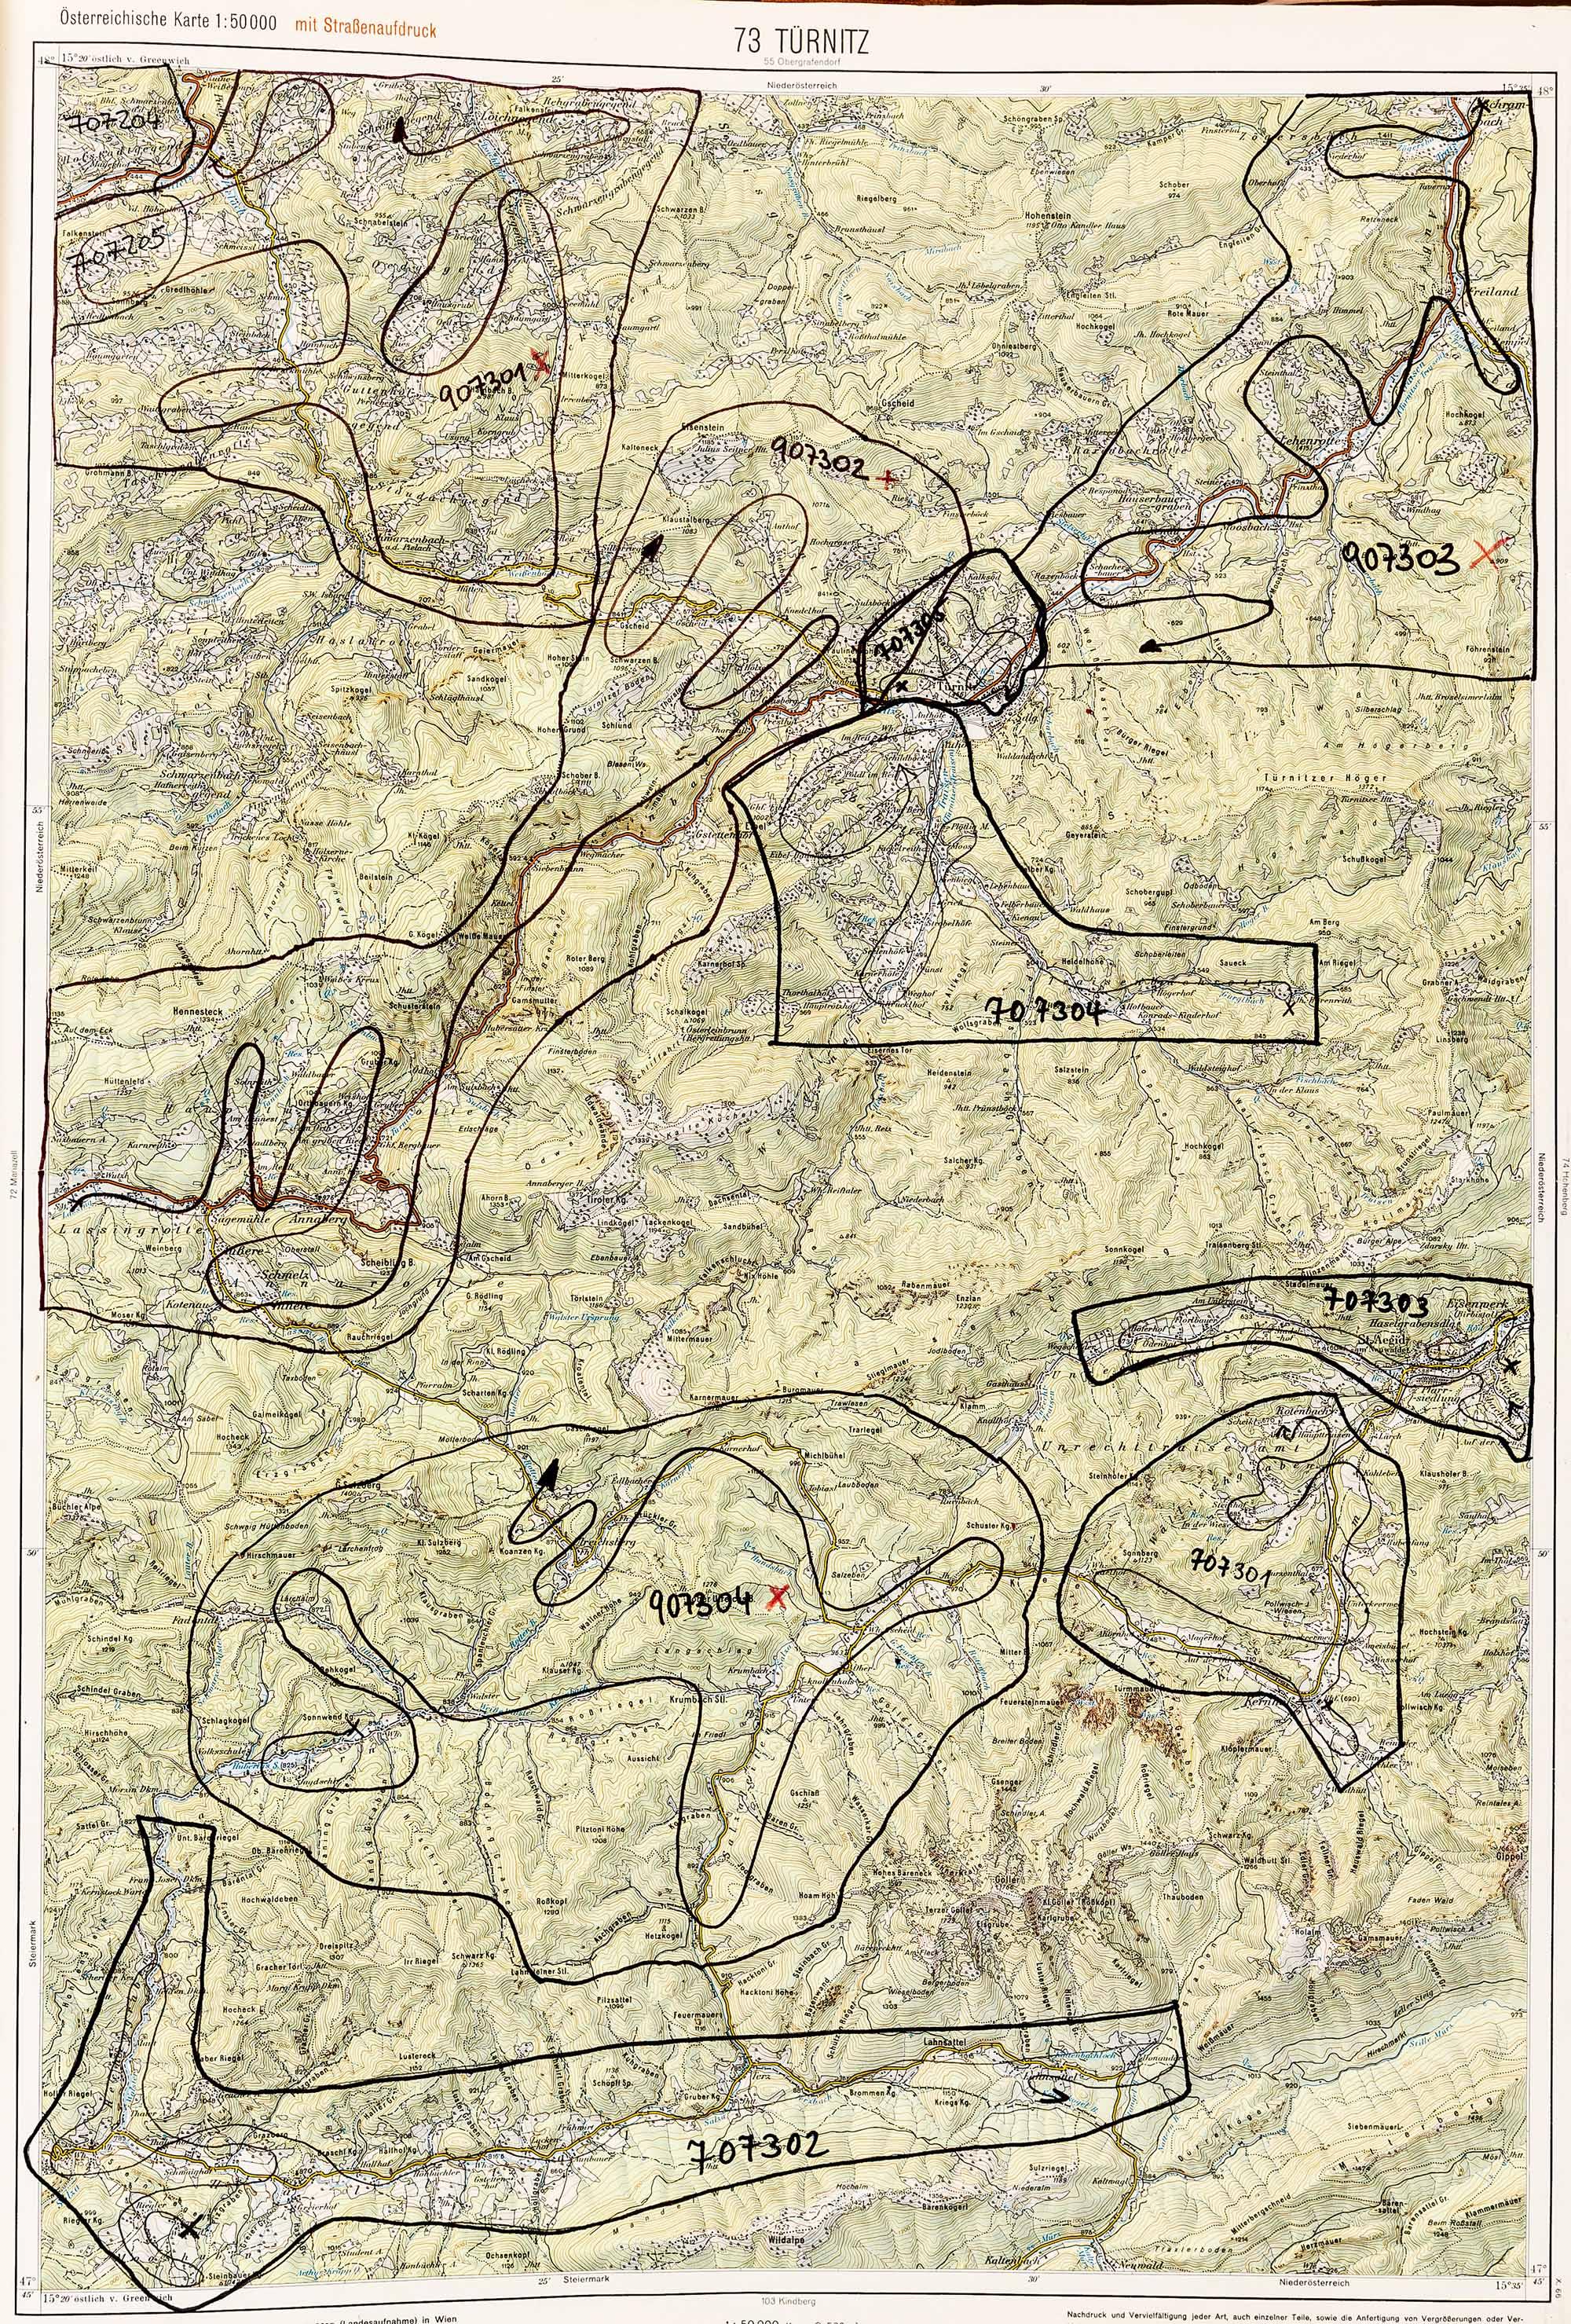 1975-1979 Karte 073